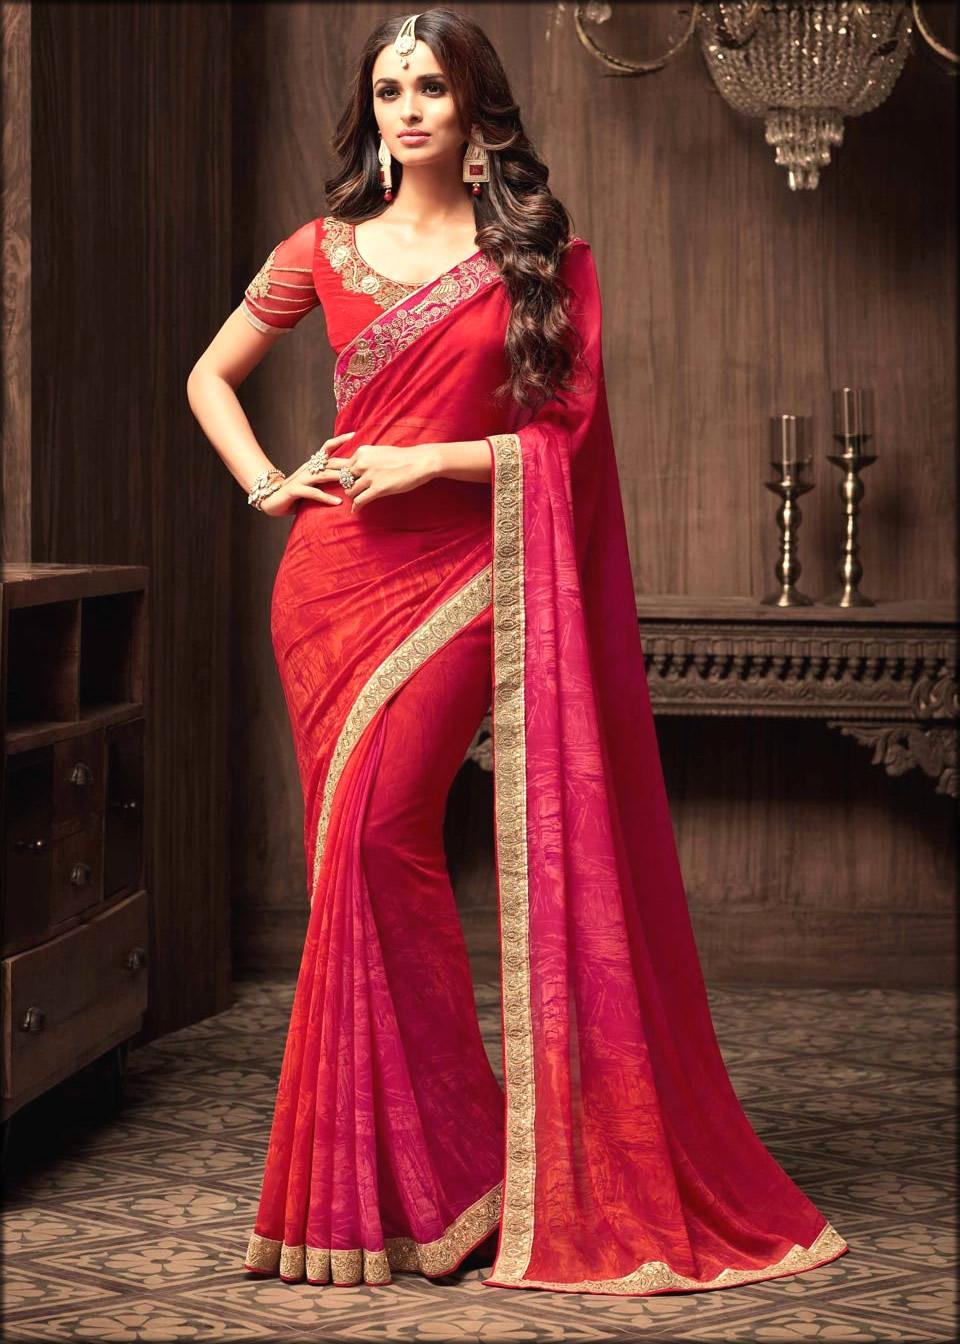 Stunning Red Colour Saree